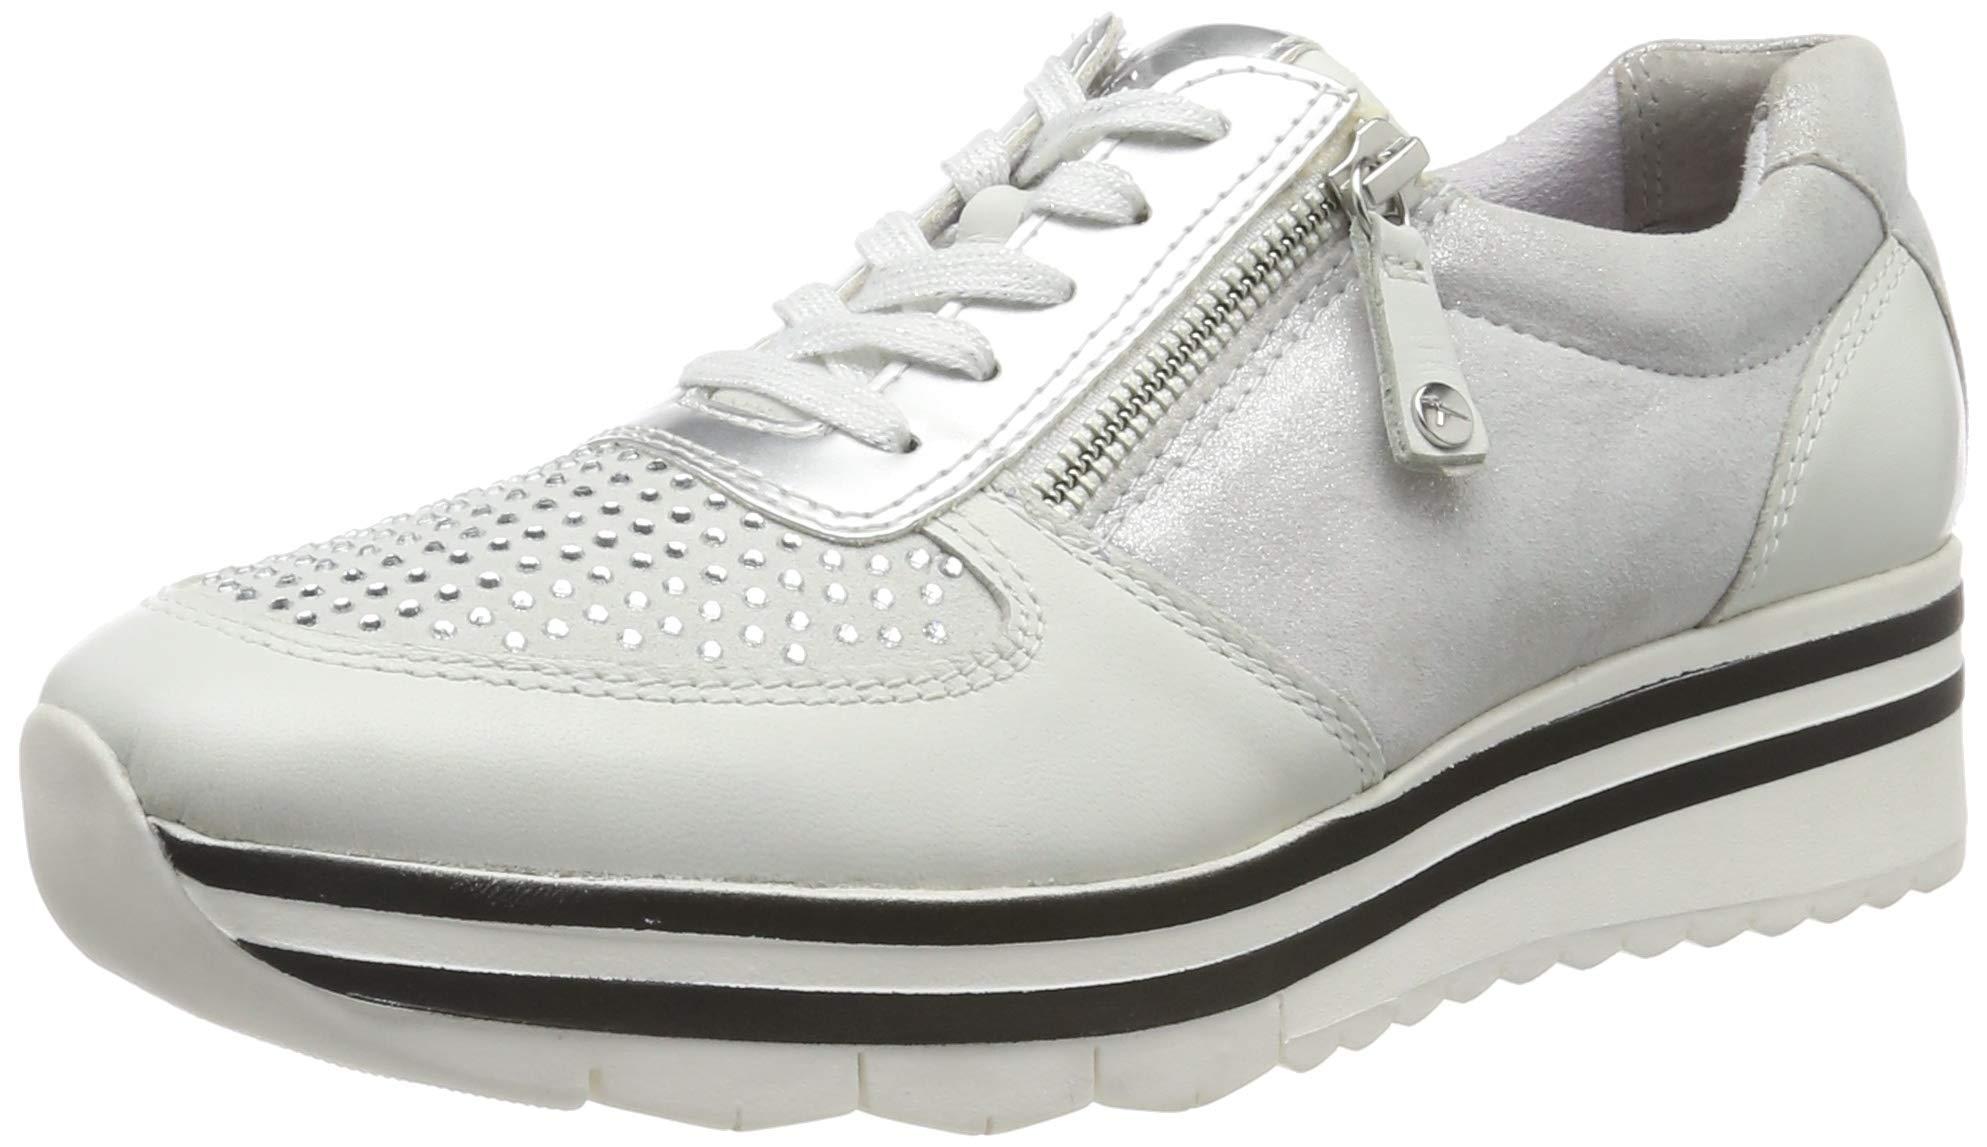 Tamaris Damen 1 1 23740 33 948 Sneaker, Silber (SILVER COMB 948), 40 EU